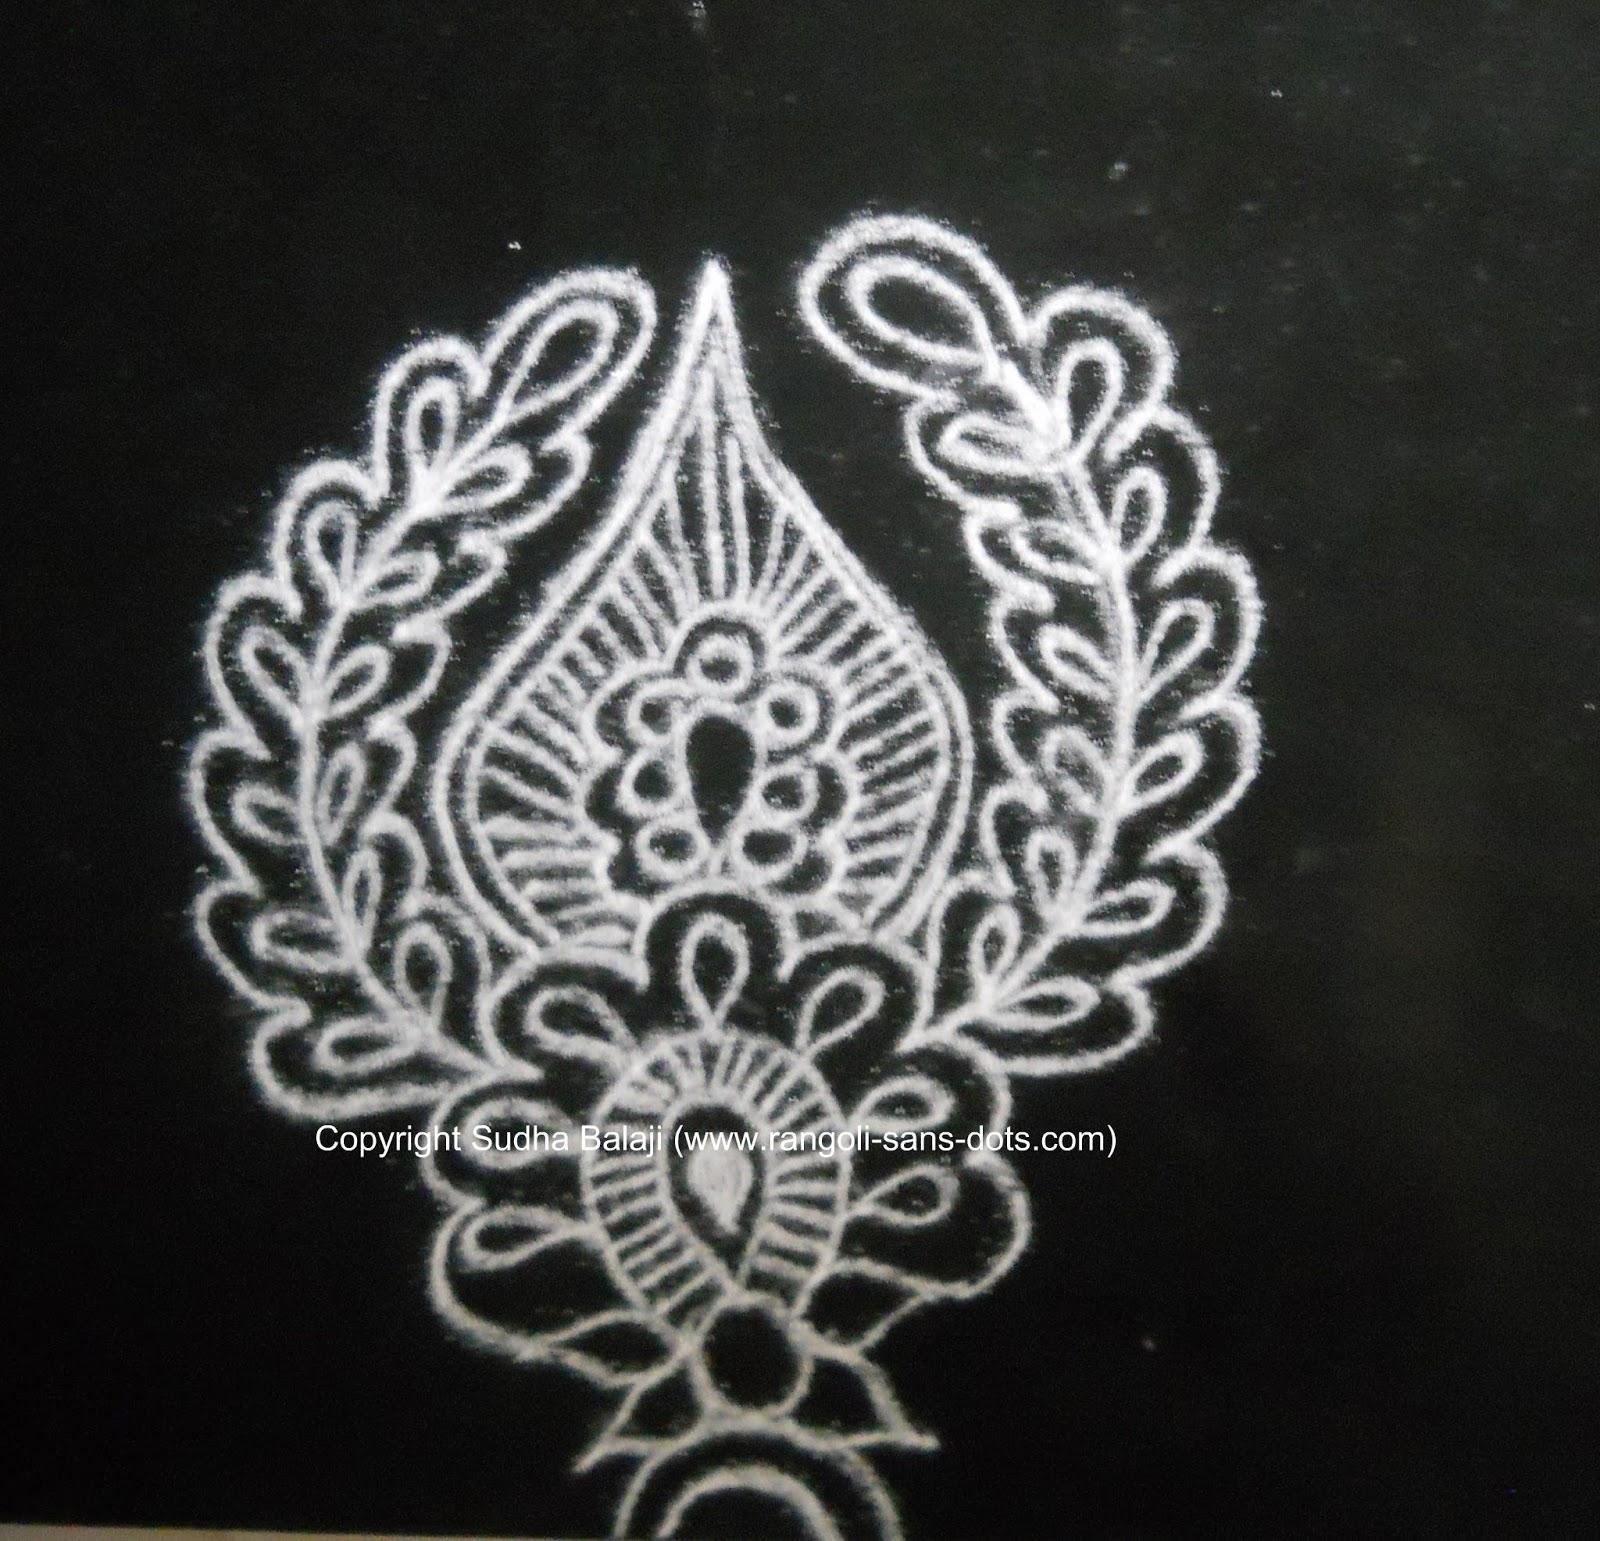 Mehndi Designs Rangoli : Book of mehndi design rangoli in india domseksa